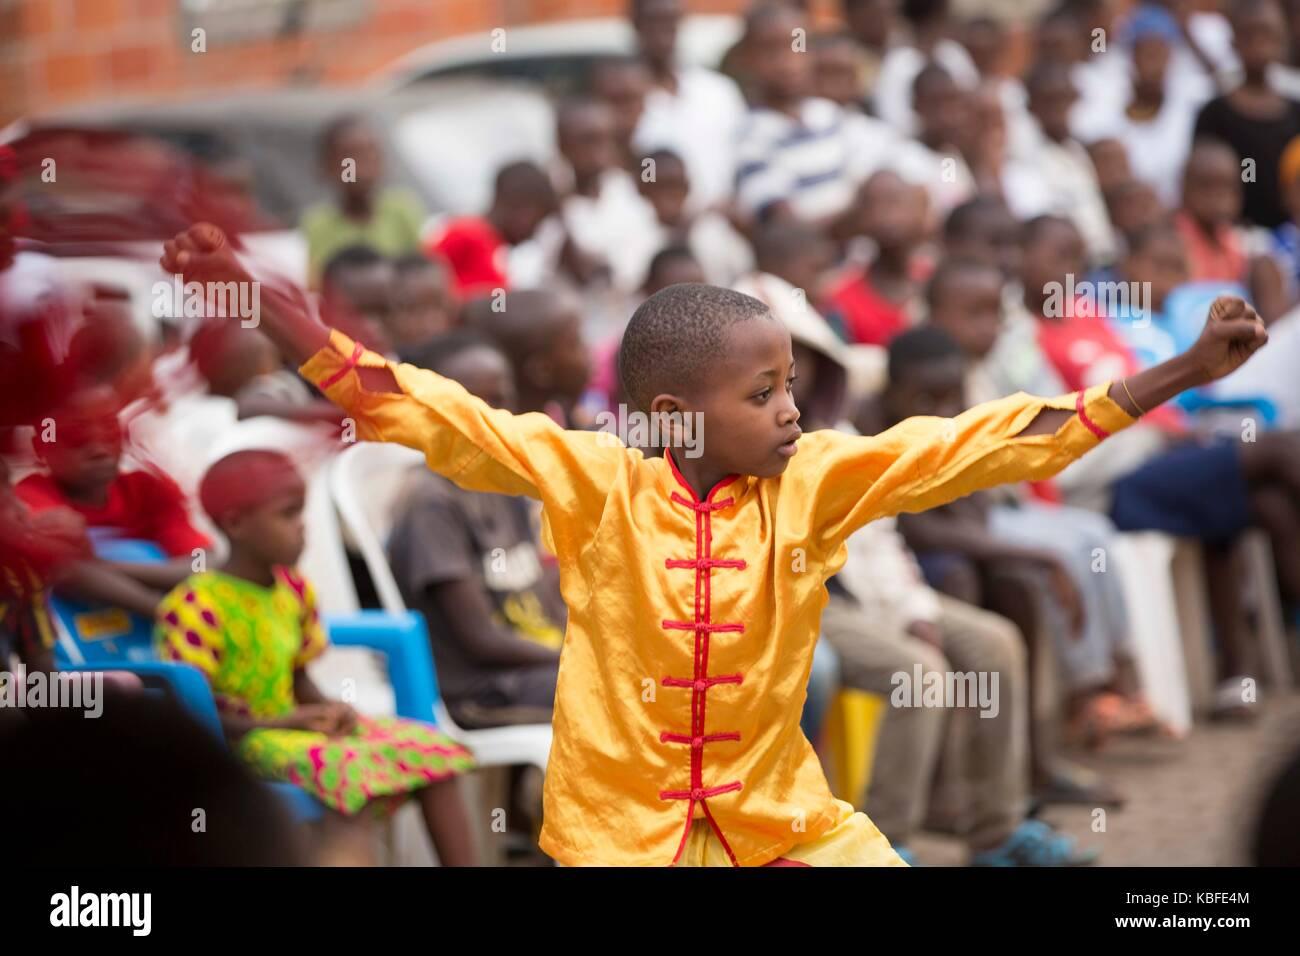 Kigali, Rwanda. 29th Sep, 2017. A Rwandan boy performs martial arts in the community of Nyamirambo Sector in Kigali, - Stock Image